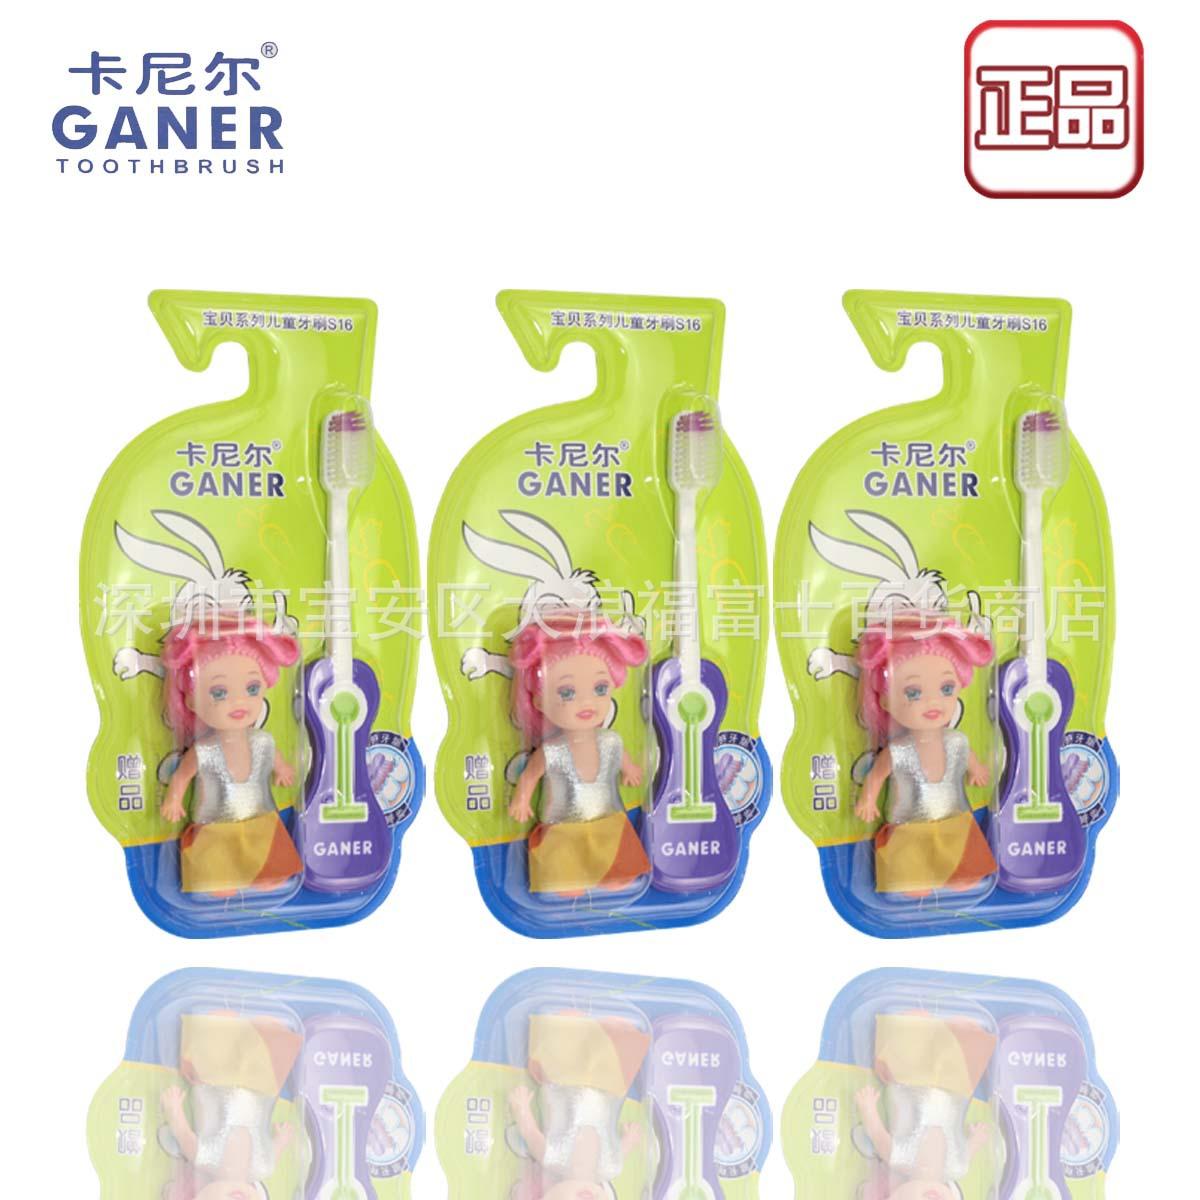 Toothbrush Garnier baby series lovely type children's fur S16 genuine factory direct sales wholesale(China (Mainland))